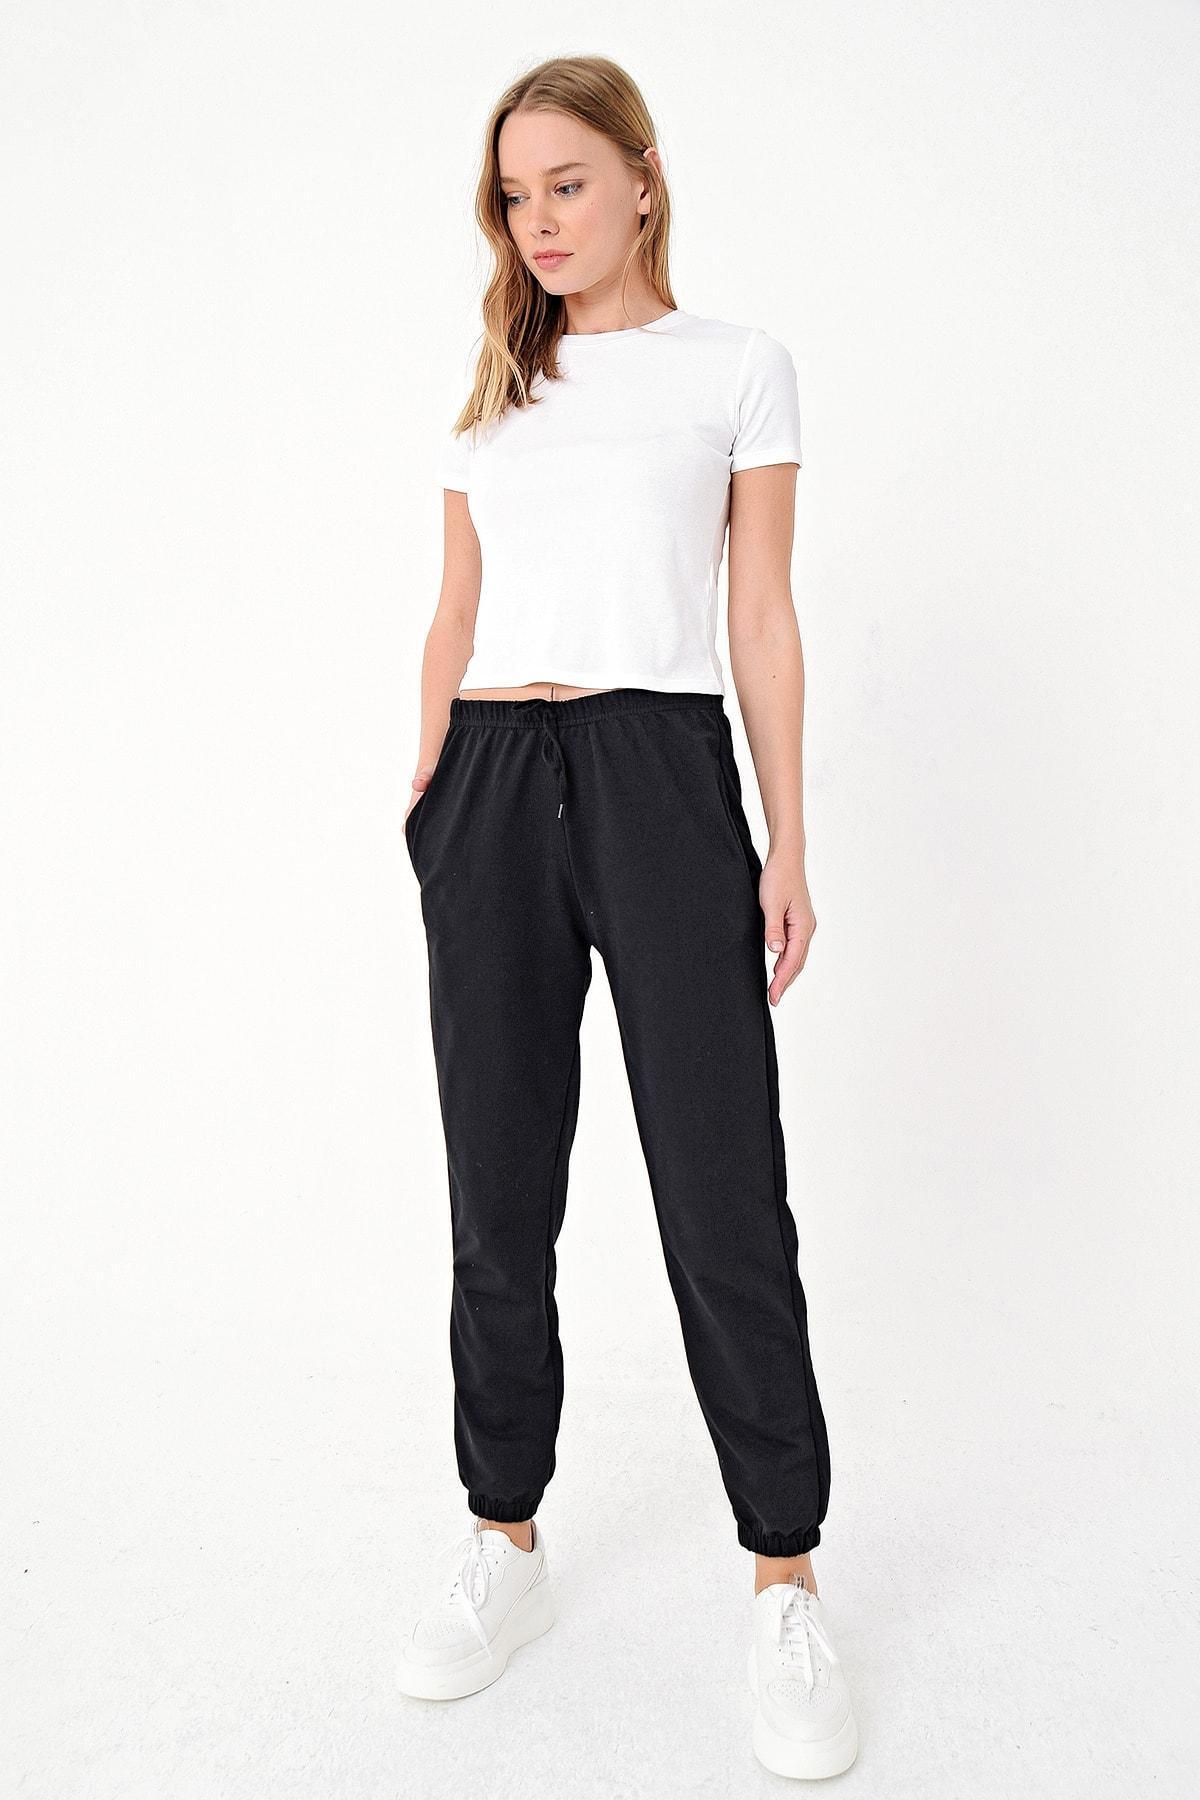 Trend Alaçatı Stili Kadın Siyah Paçası Lastikli İki İplik Eşofman Altı ALC-Y2933 1